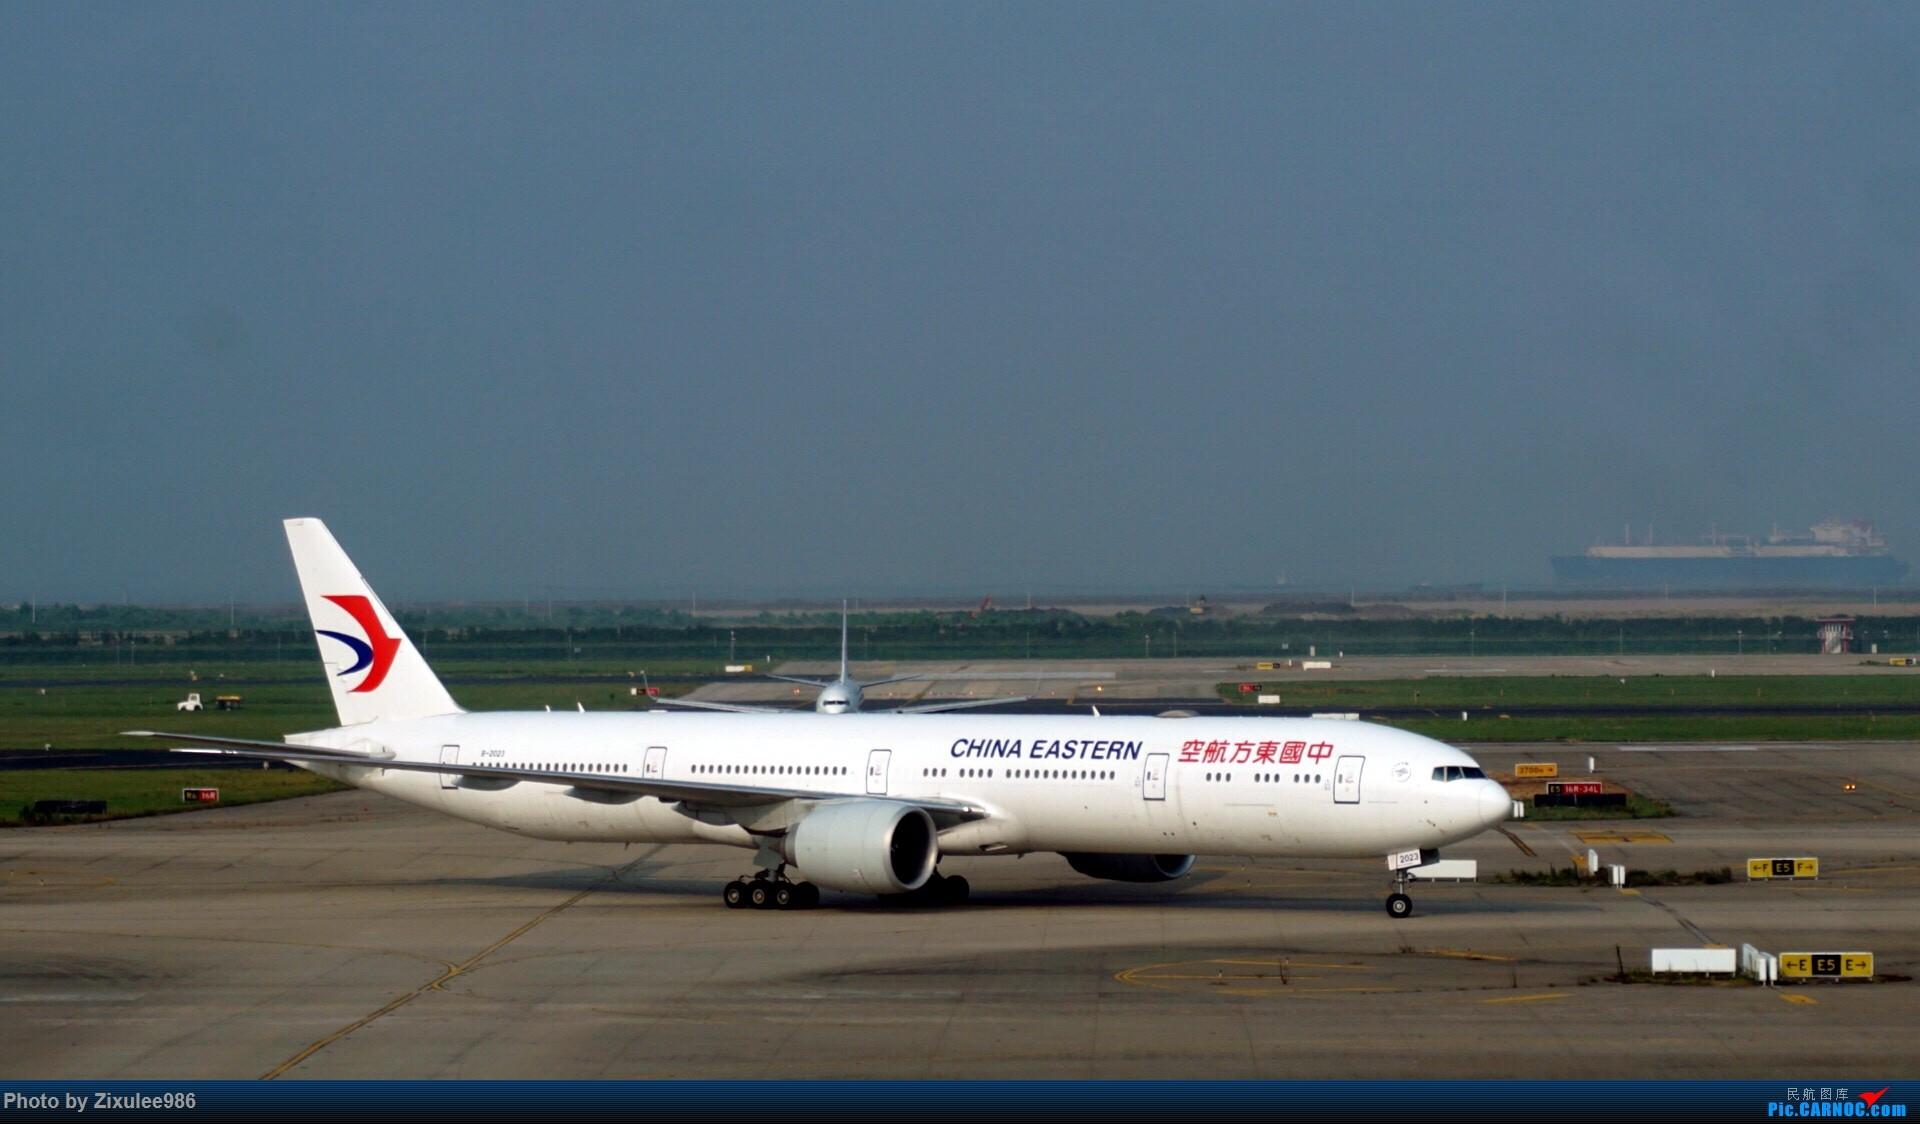 Re:[原创]加拿大21日游学之旅 (二)~加航AC28..PVG-YYZ到达多村后的雨天~多图缓更,请各位大侠谅解~ BOEING 777-39P(ER) B-2023 中国上海浦东国际机场